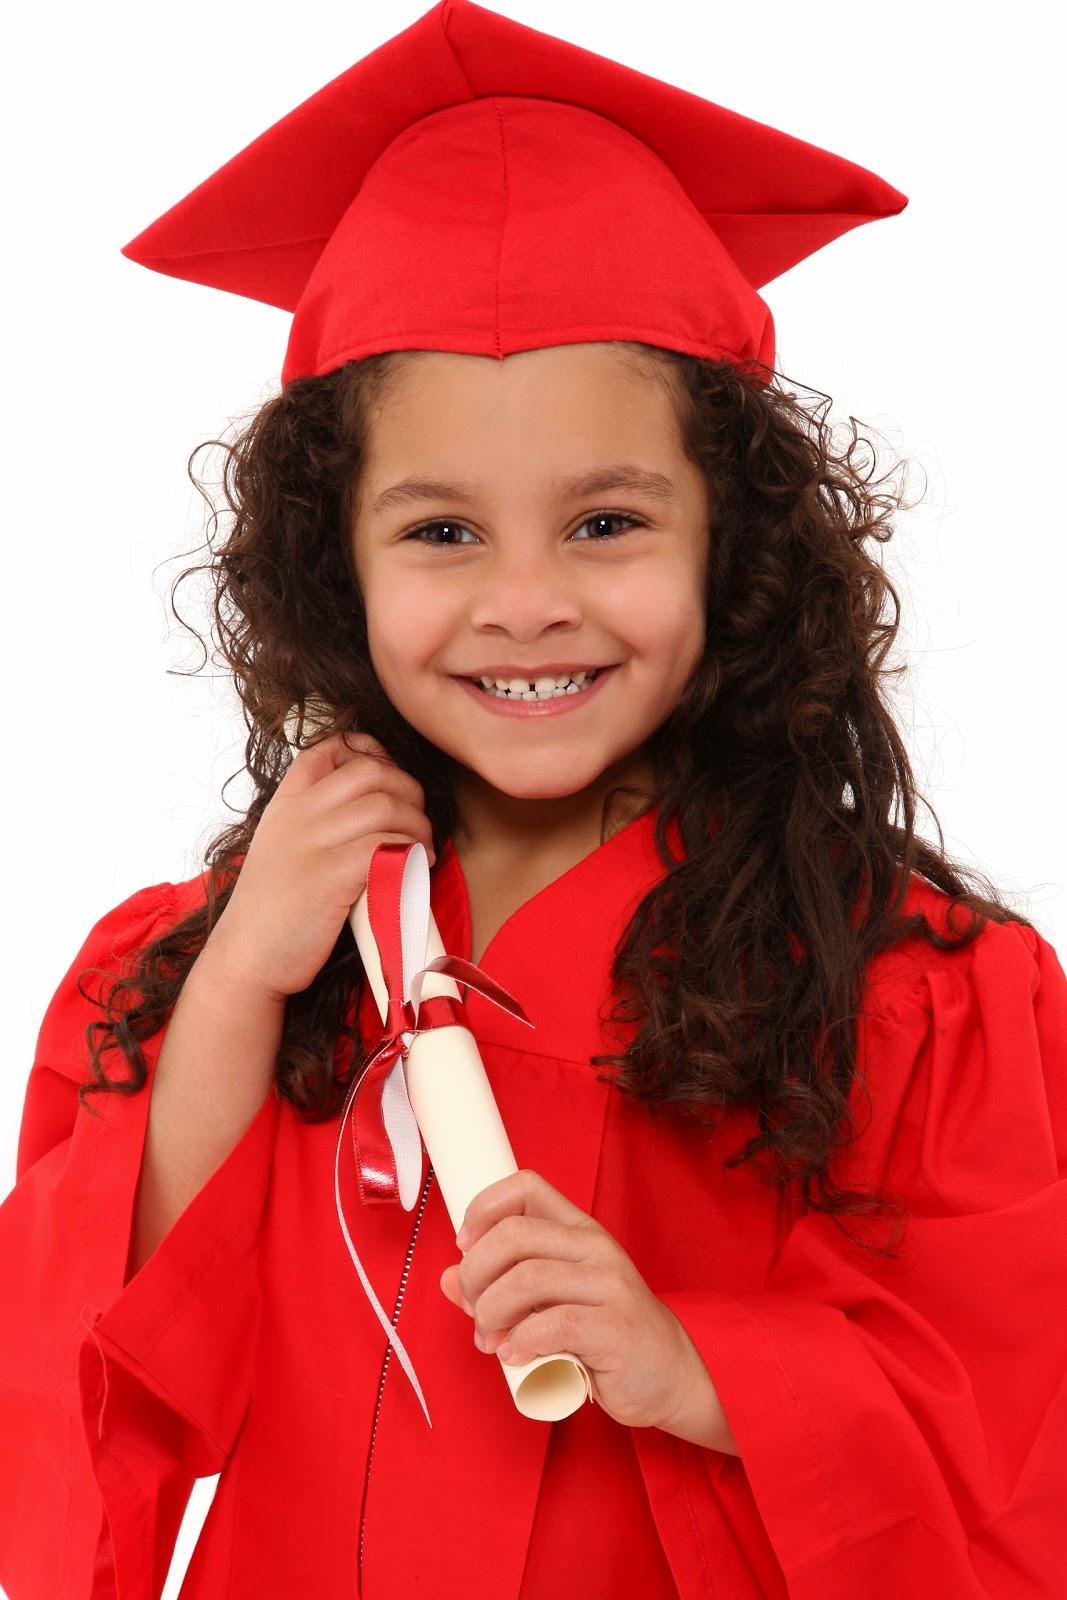 Graduation Shop Preschool Graduation Cap And Gown Packages Perfect